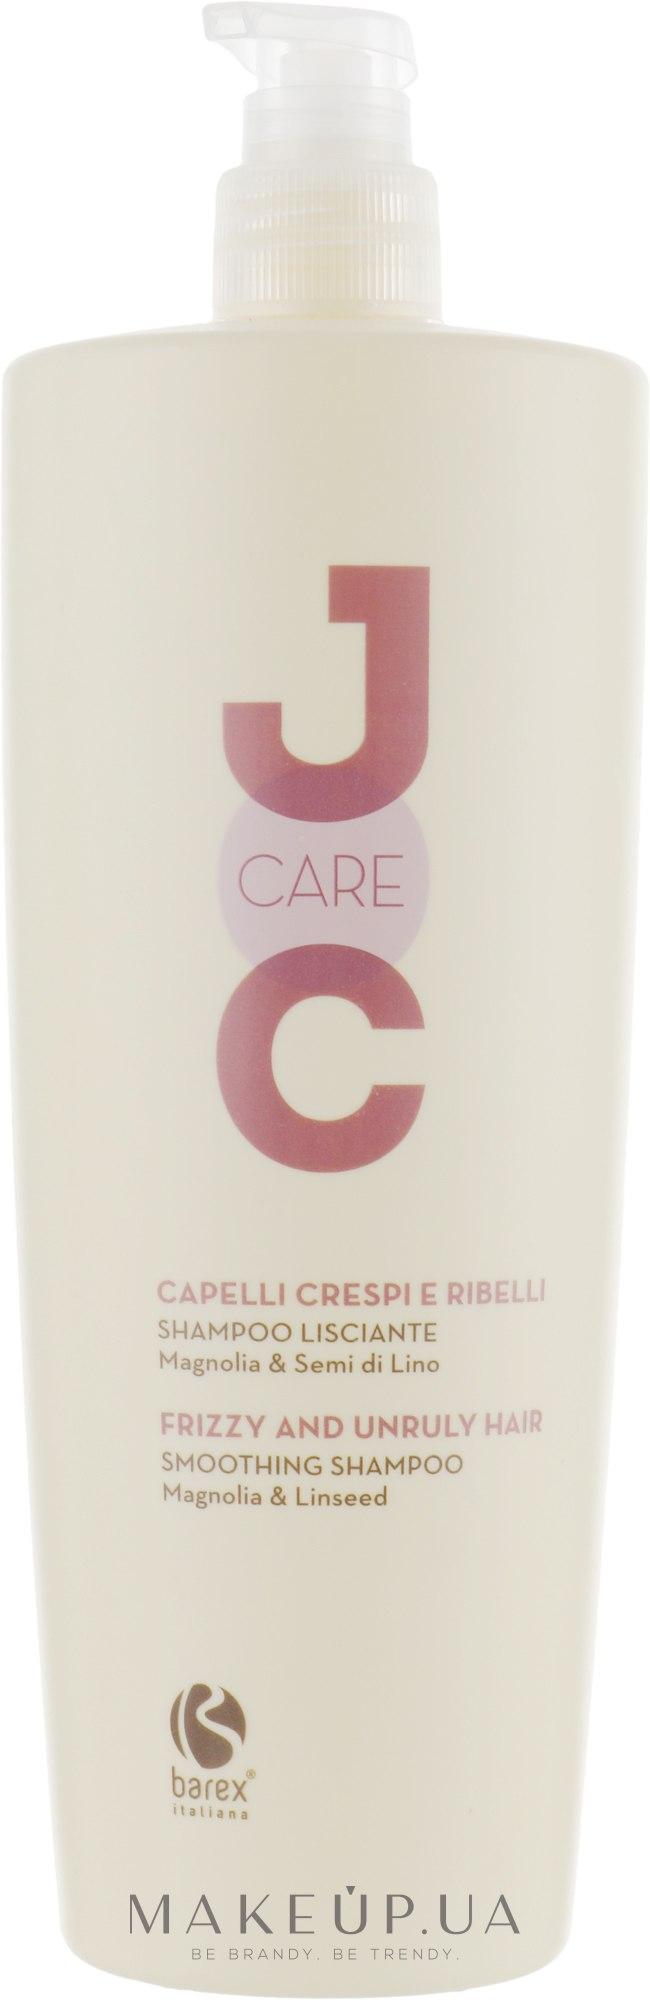 Шампунь разглаживающий для непослушных волос - Barex Italiana Joc Care Smoothing Shampoo — фото 1000ml